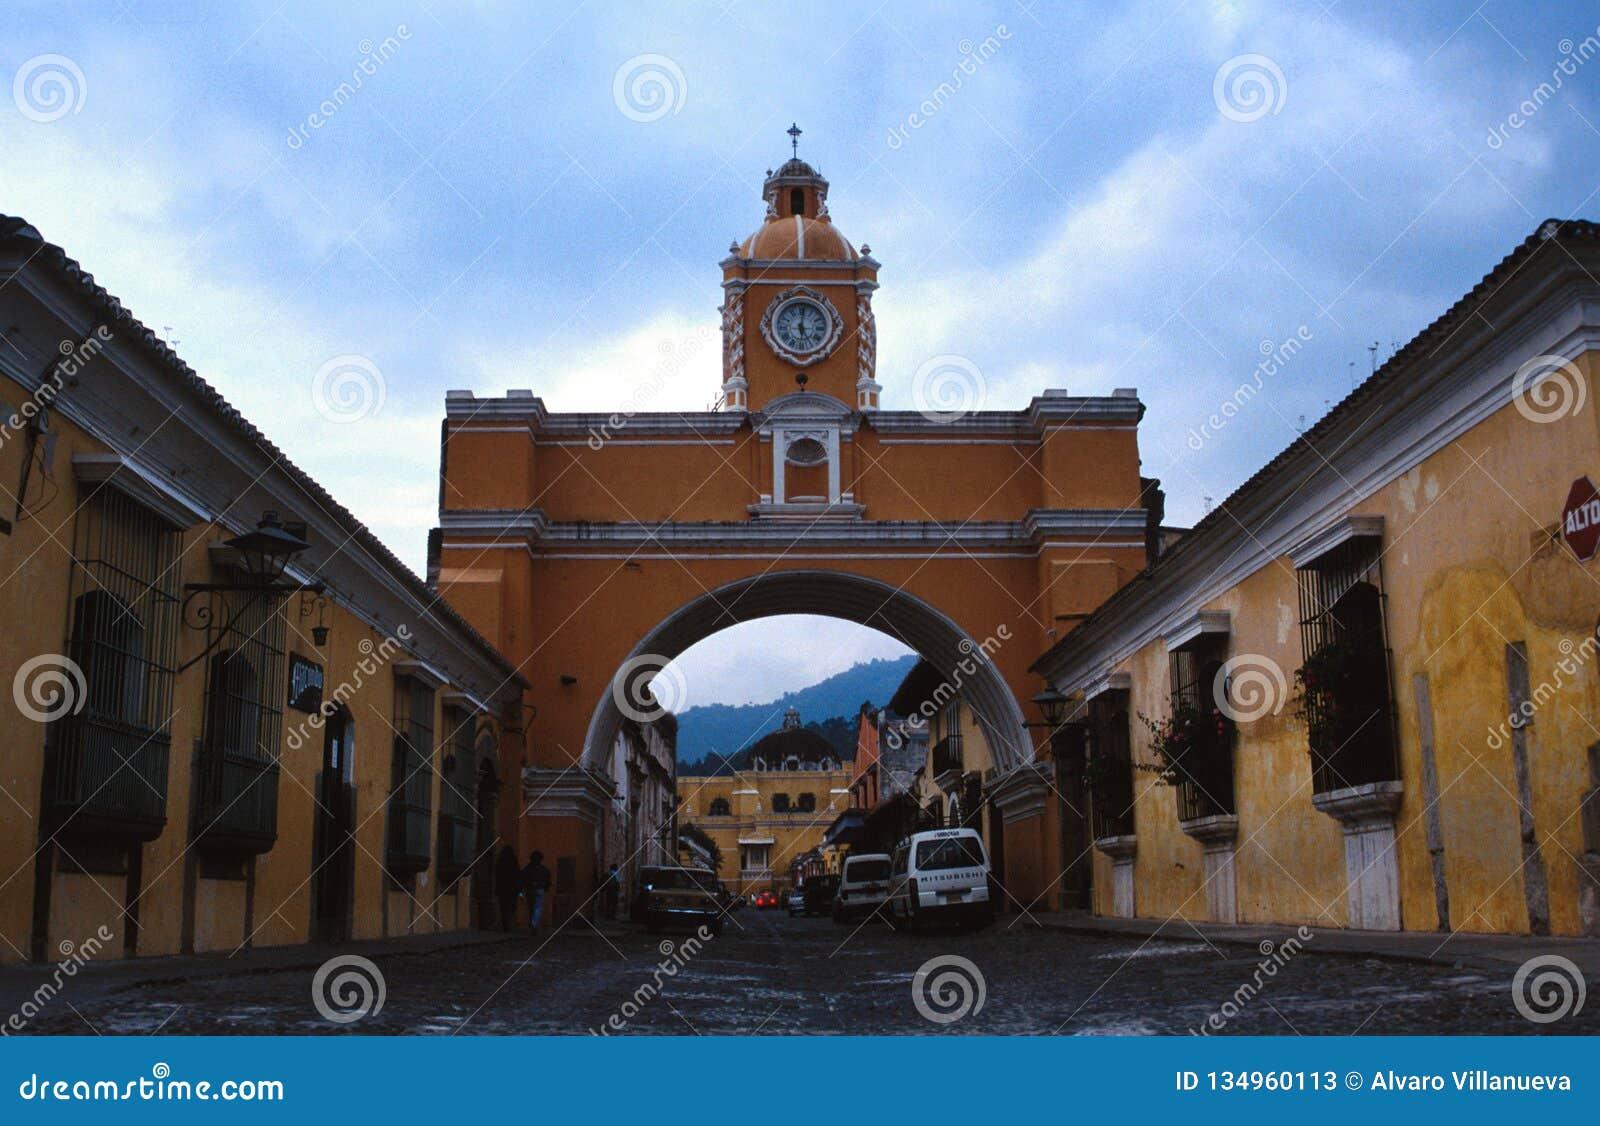 Arco de Santa Catalina in Antigua, Guatemala